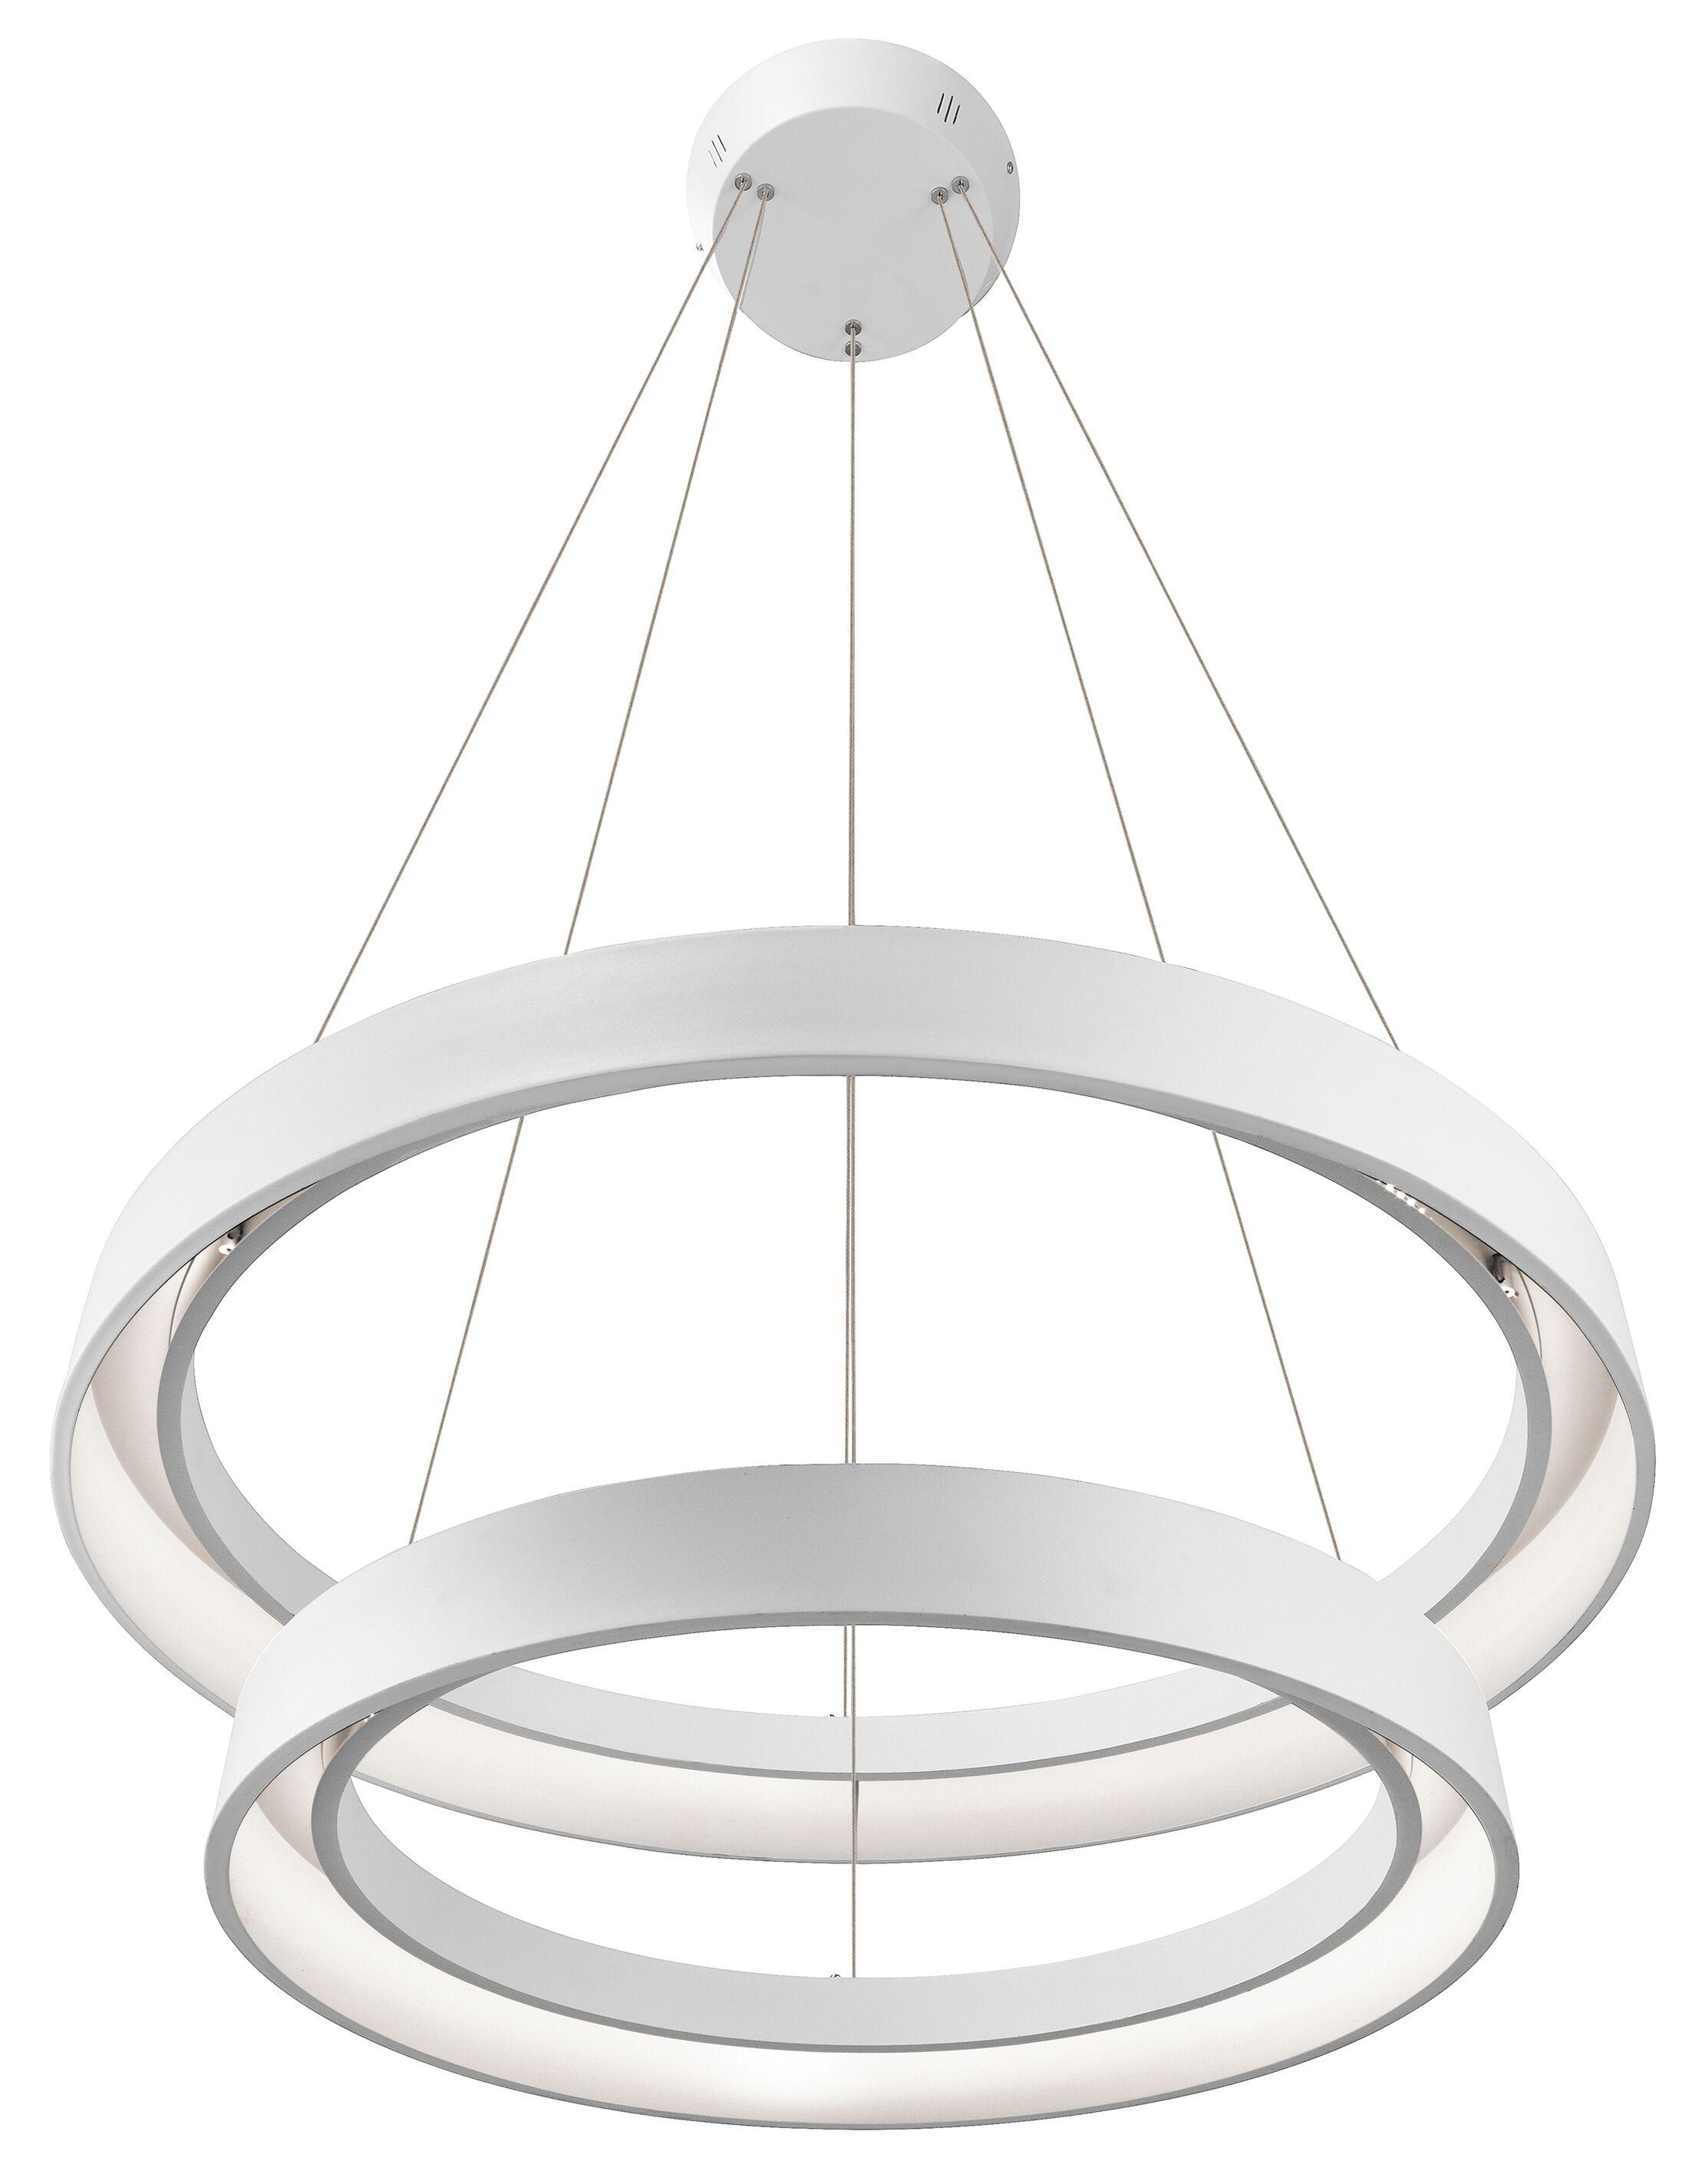 Rhianna 2-Light Pendant Finish: Sand Textured White